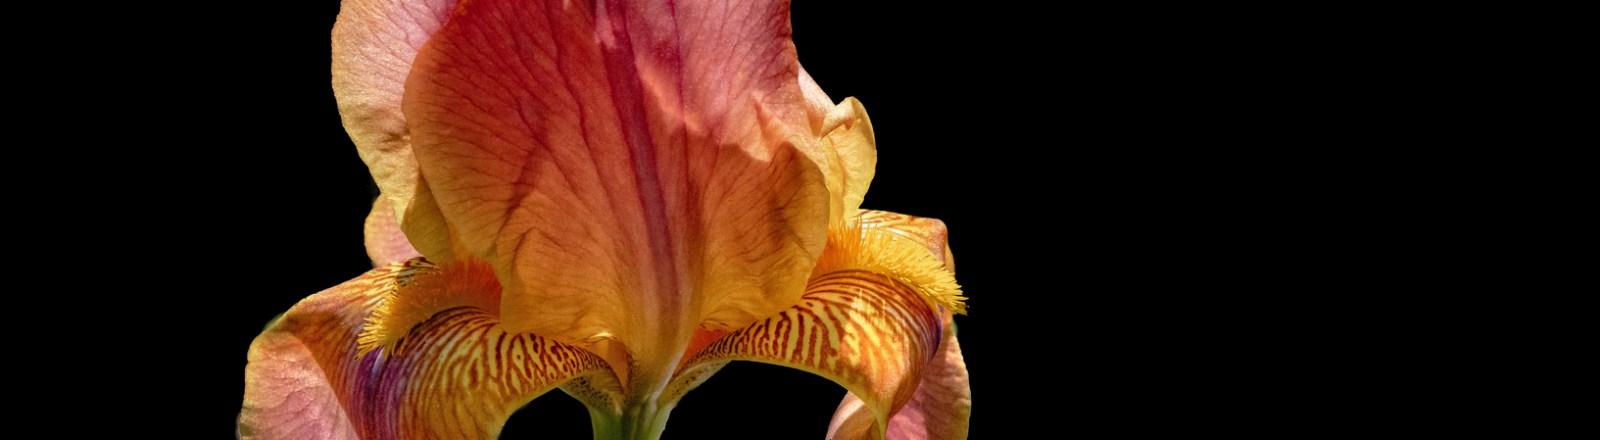 A Profusion of Irises: Sun-Kissed Shades of Orange